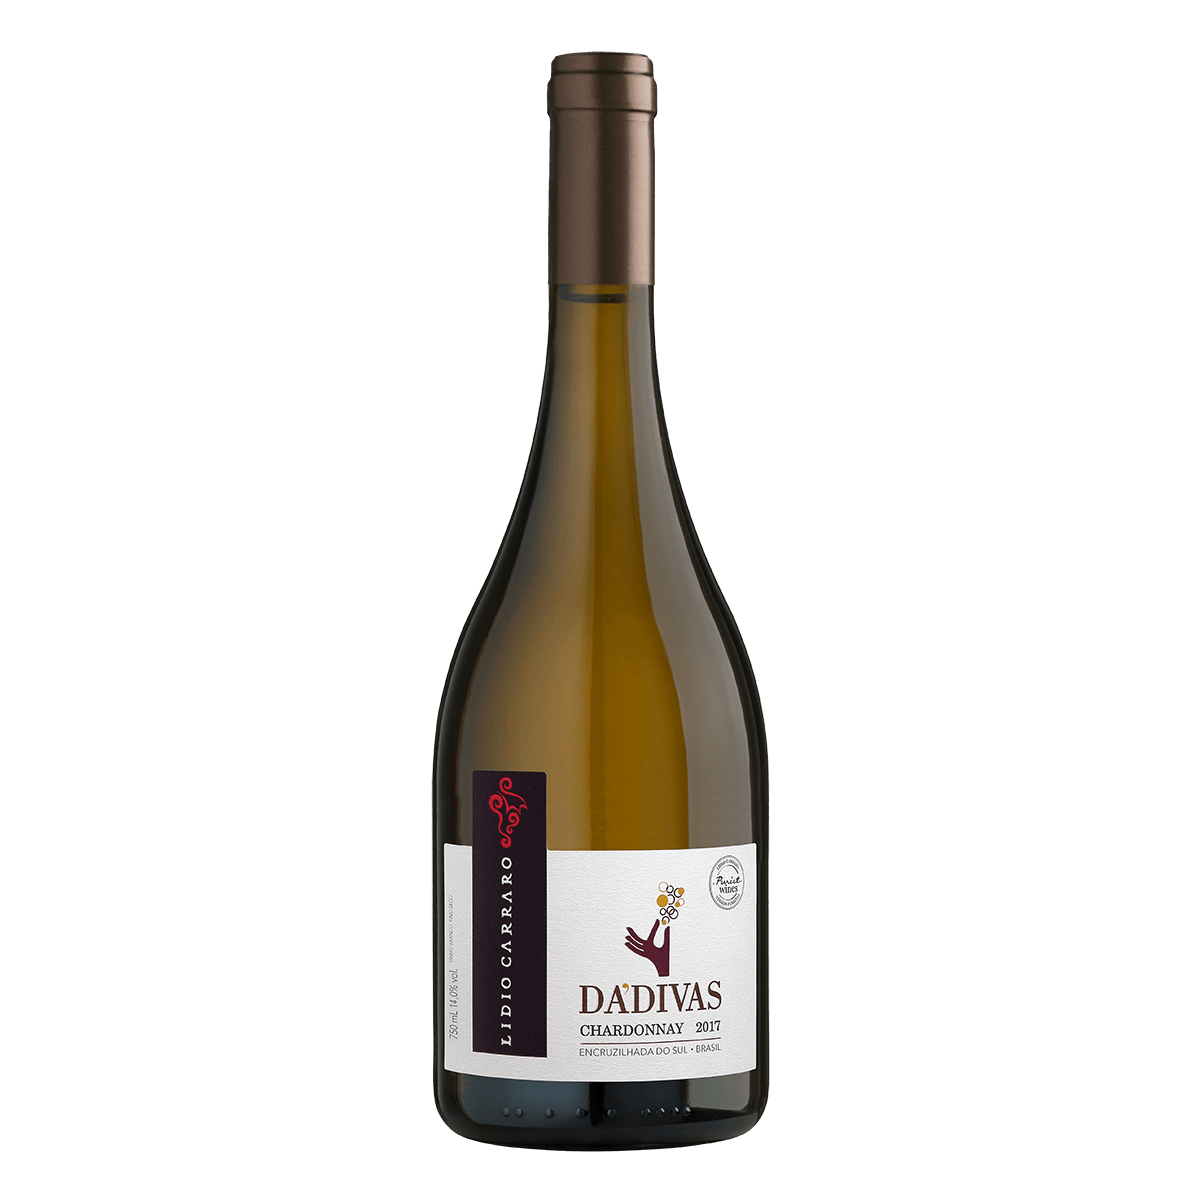 Lidio Carraro Dadivas Chardonnay 750ml